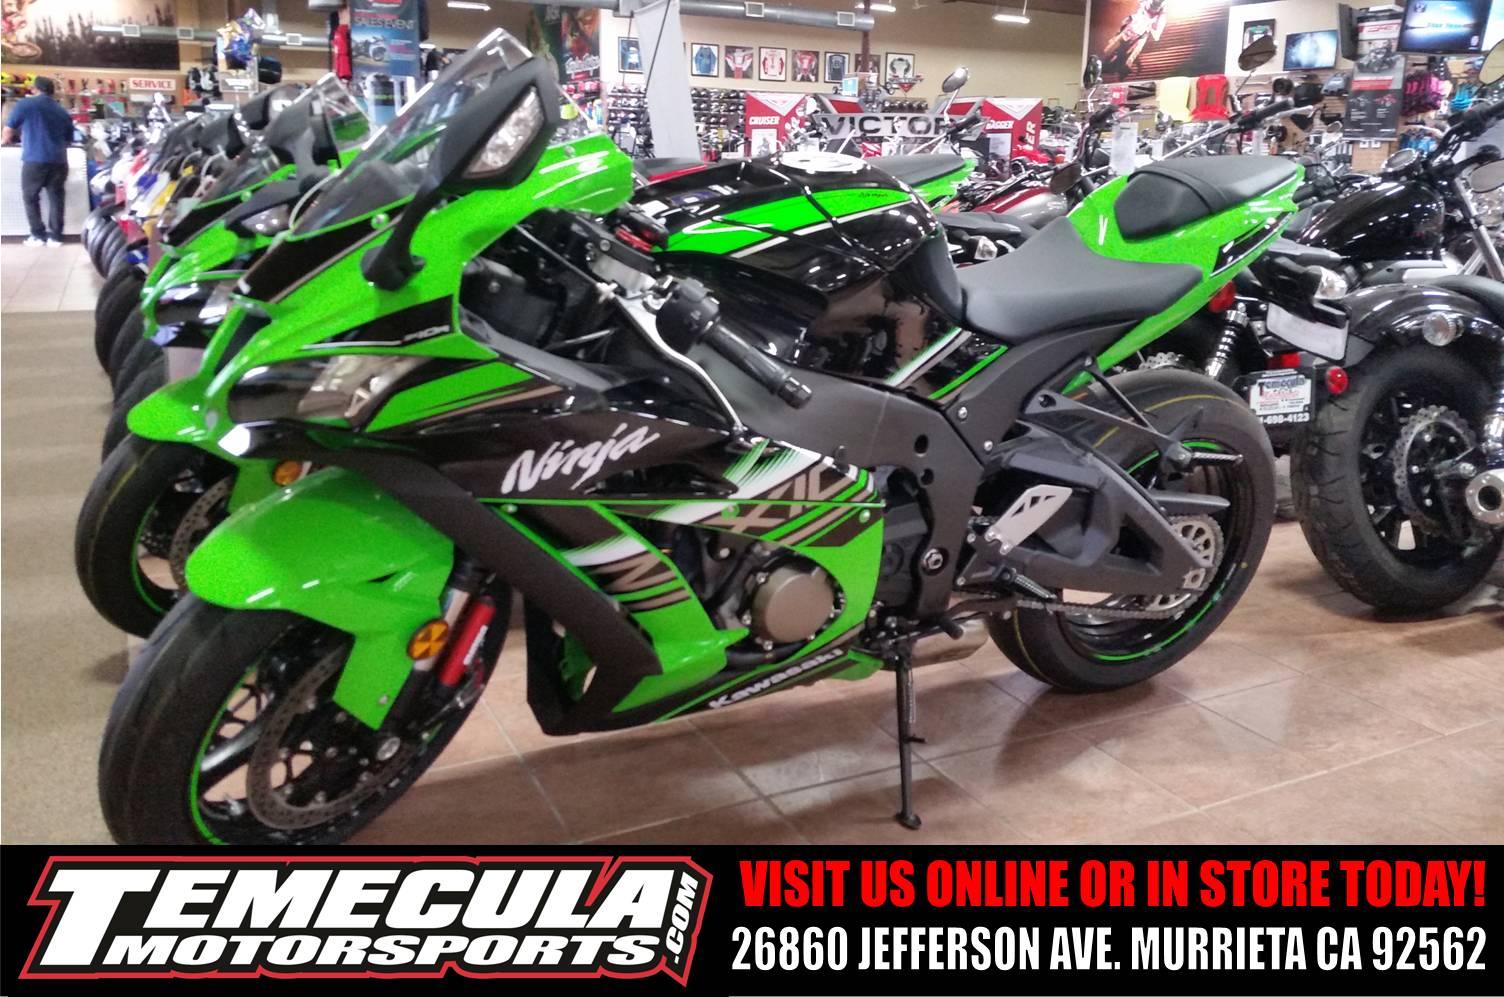 2016 Kawasaki Ninja ZX-10R KRT Edition in Murrieta, California